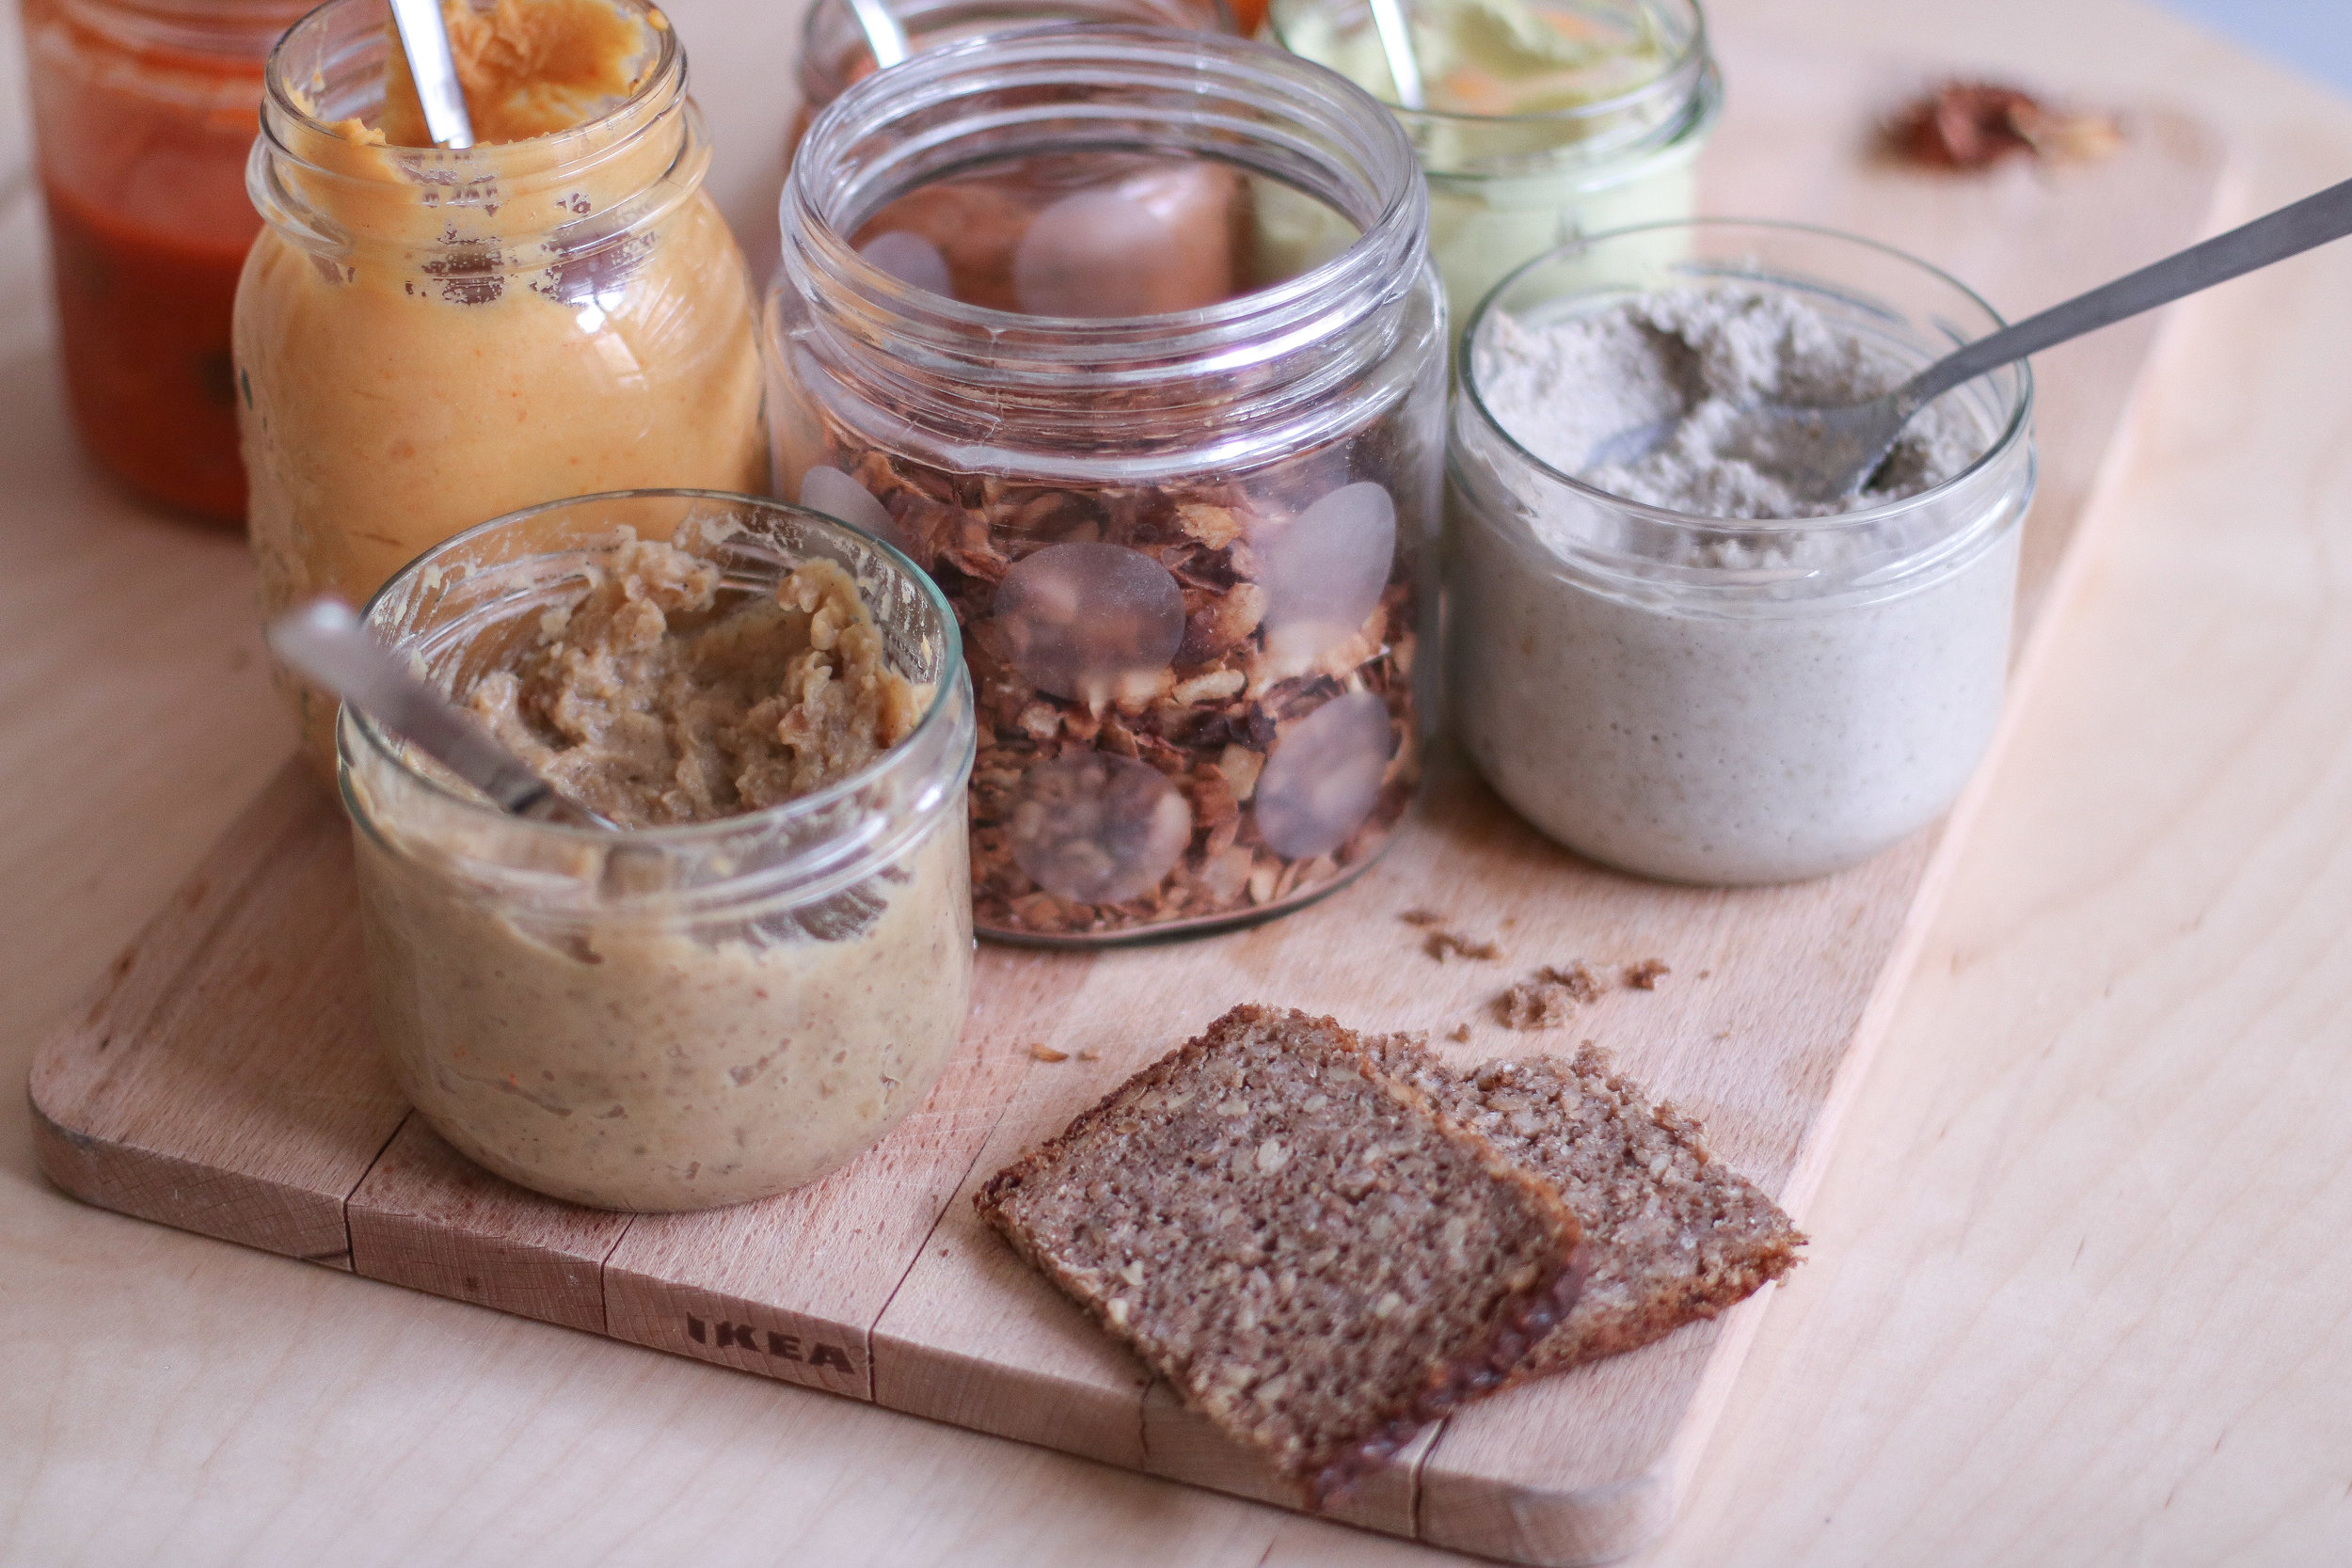 Dips & Bread Spreads workshop